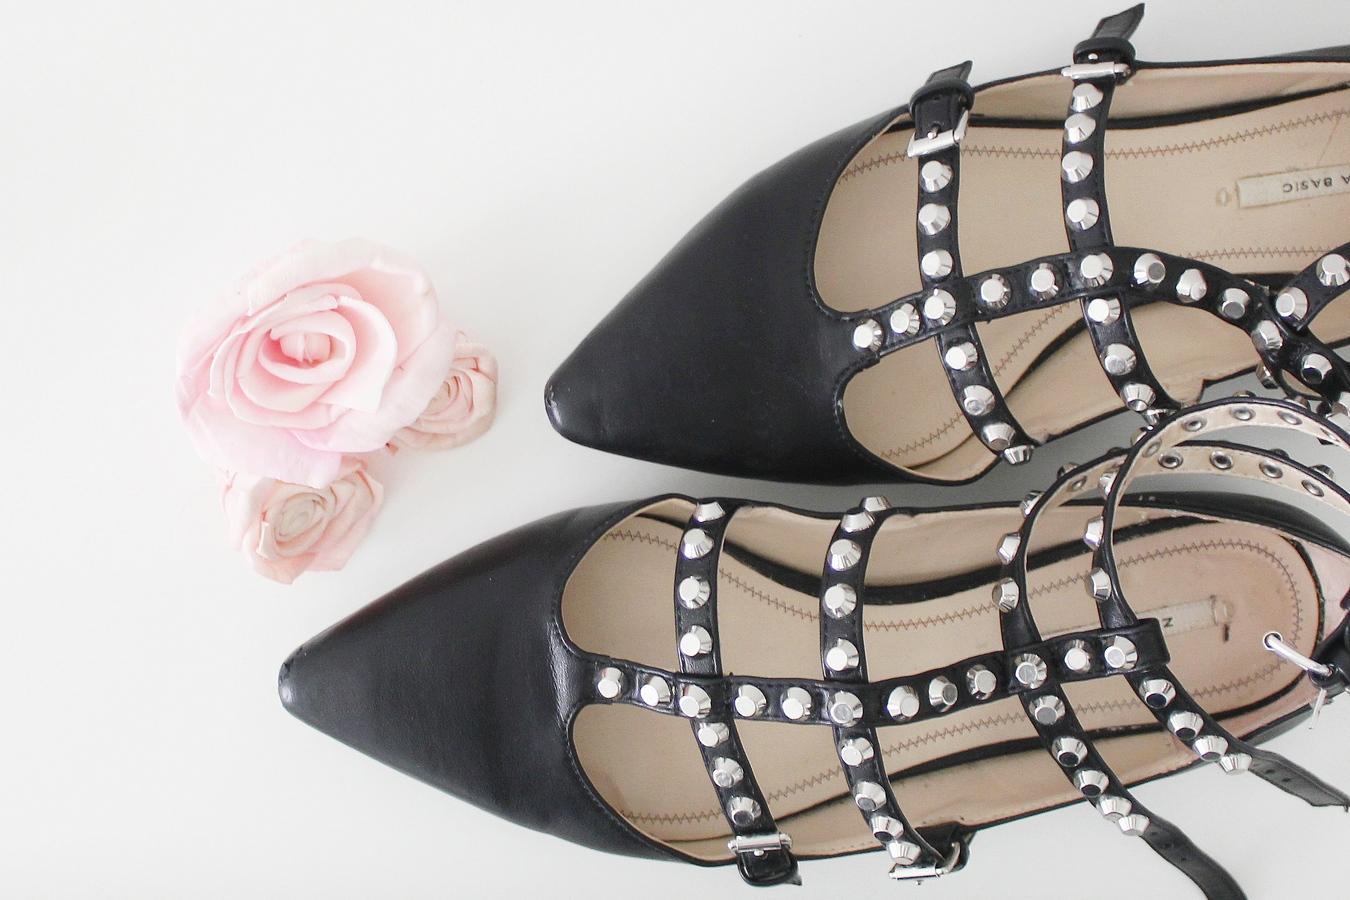 mignonneries chaussures zara rockstud valentino - Du style madame - blog mode paris